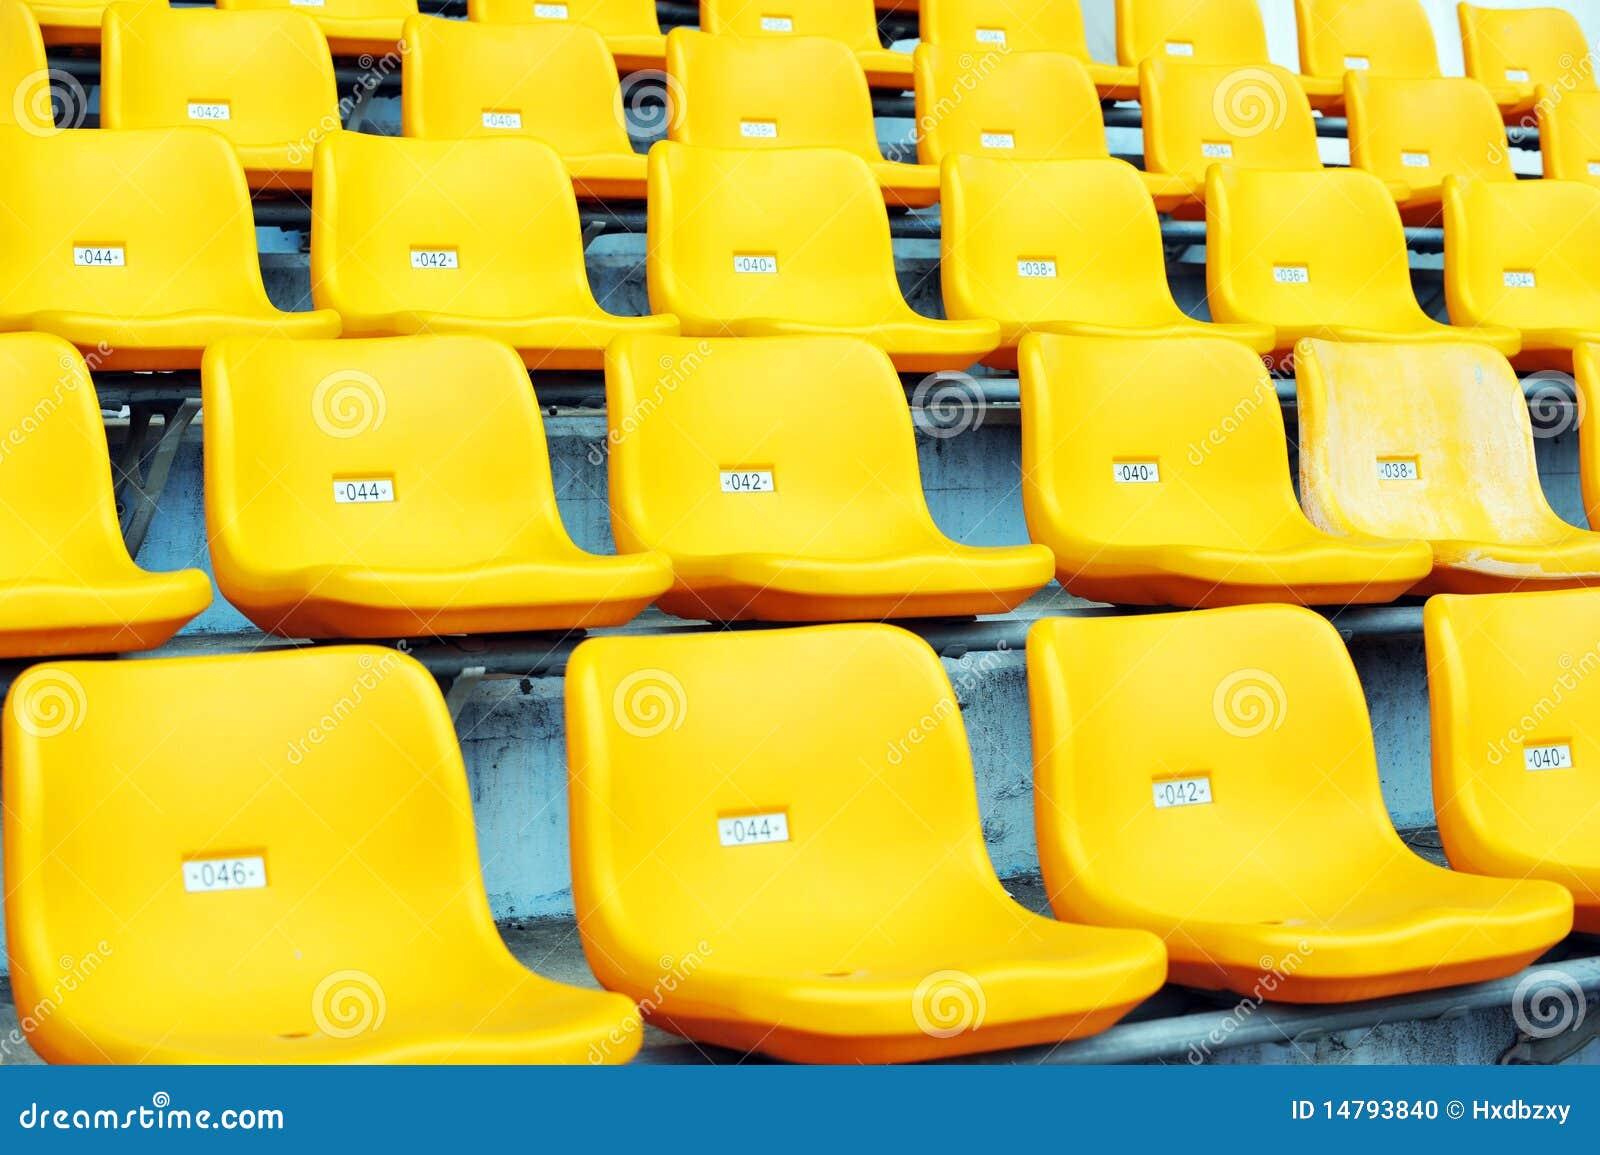 yellow football seats stock photo